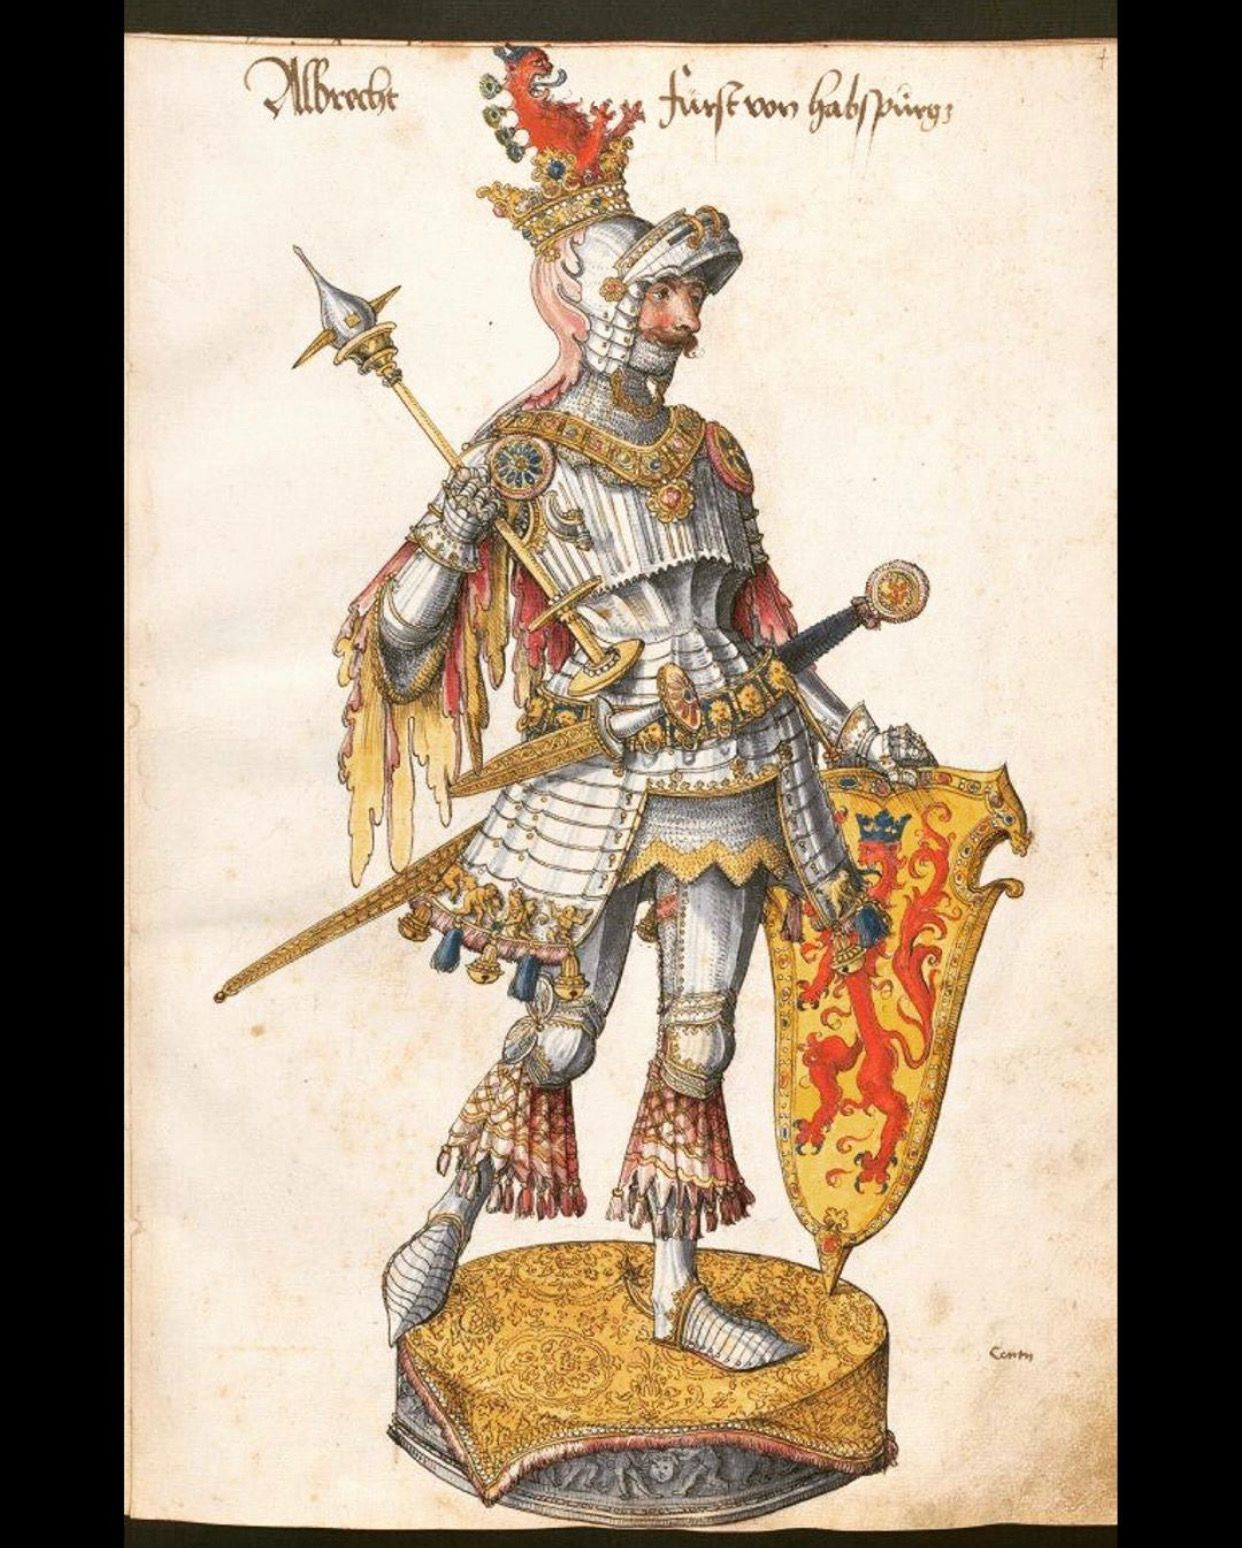 Pin By 오현이 On Armor Historical Artwork Medieval Artwork Medieval Art